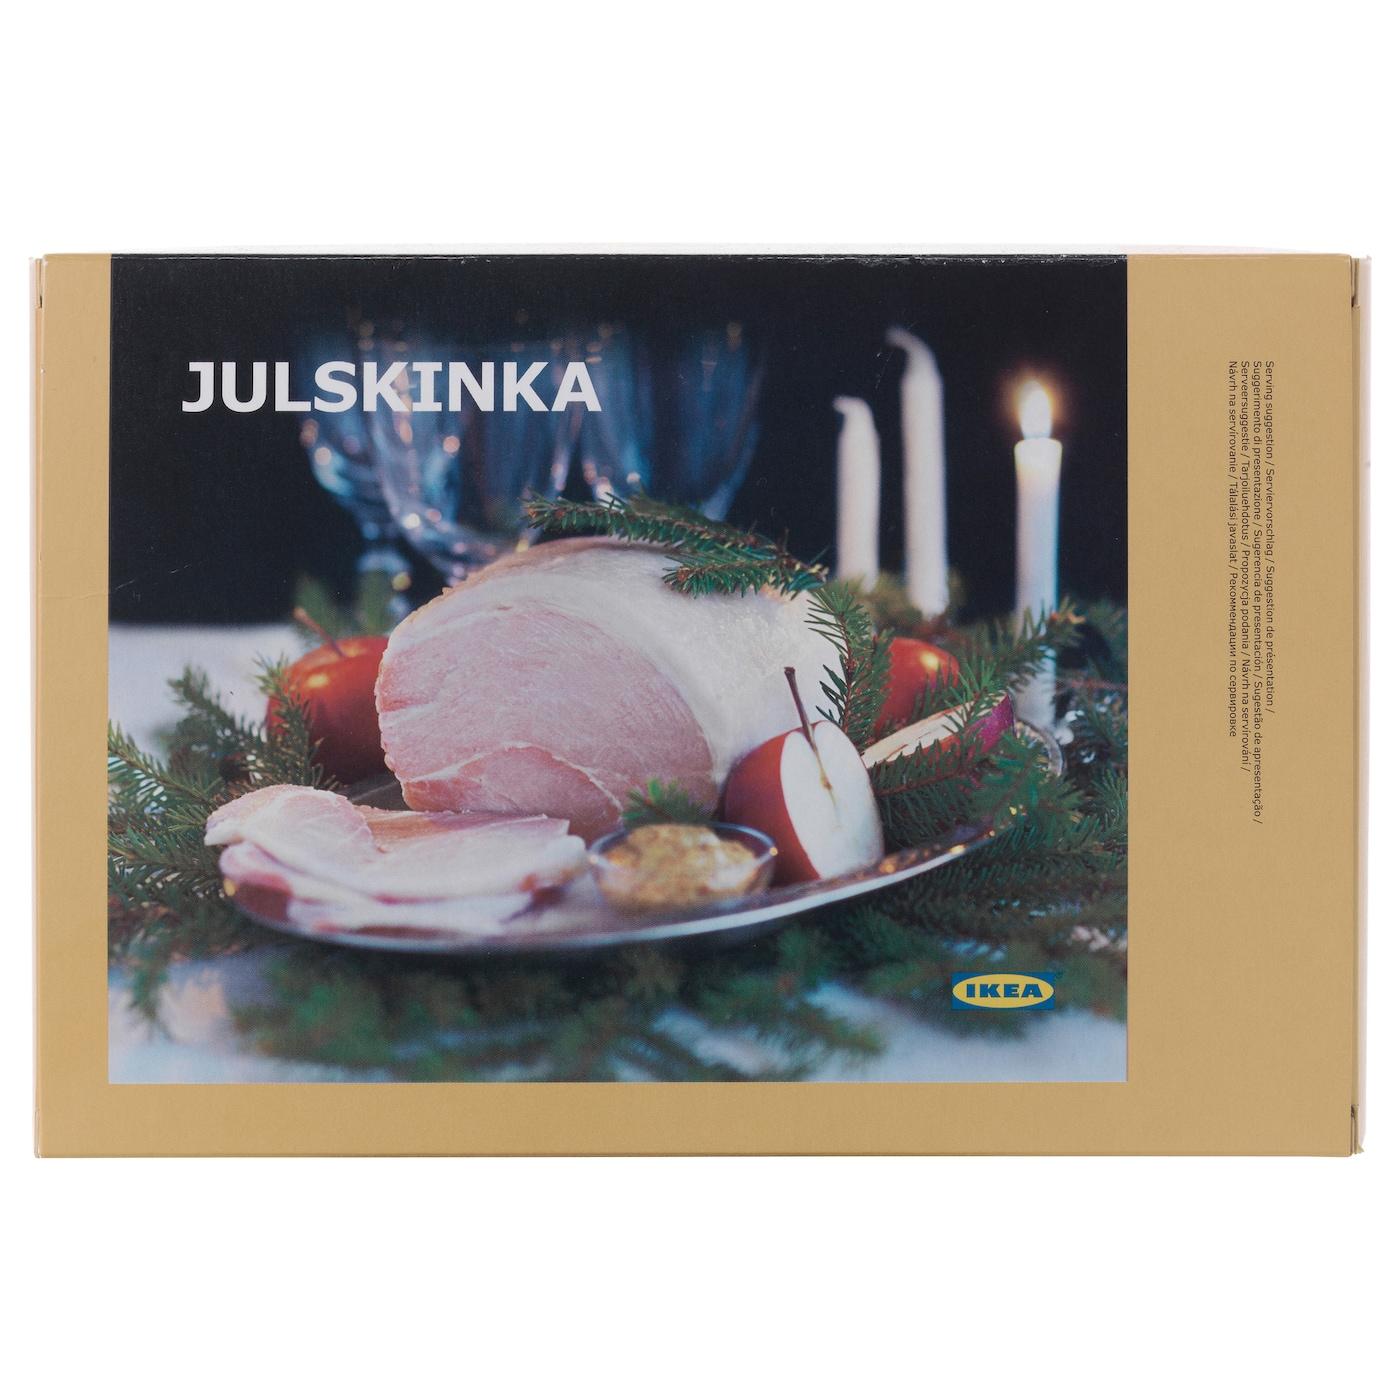 Julskinka Christmas Ham Frozen Ikea